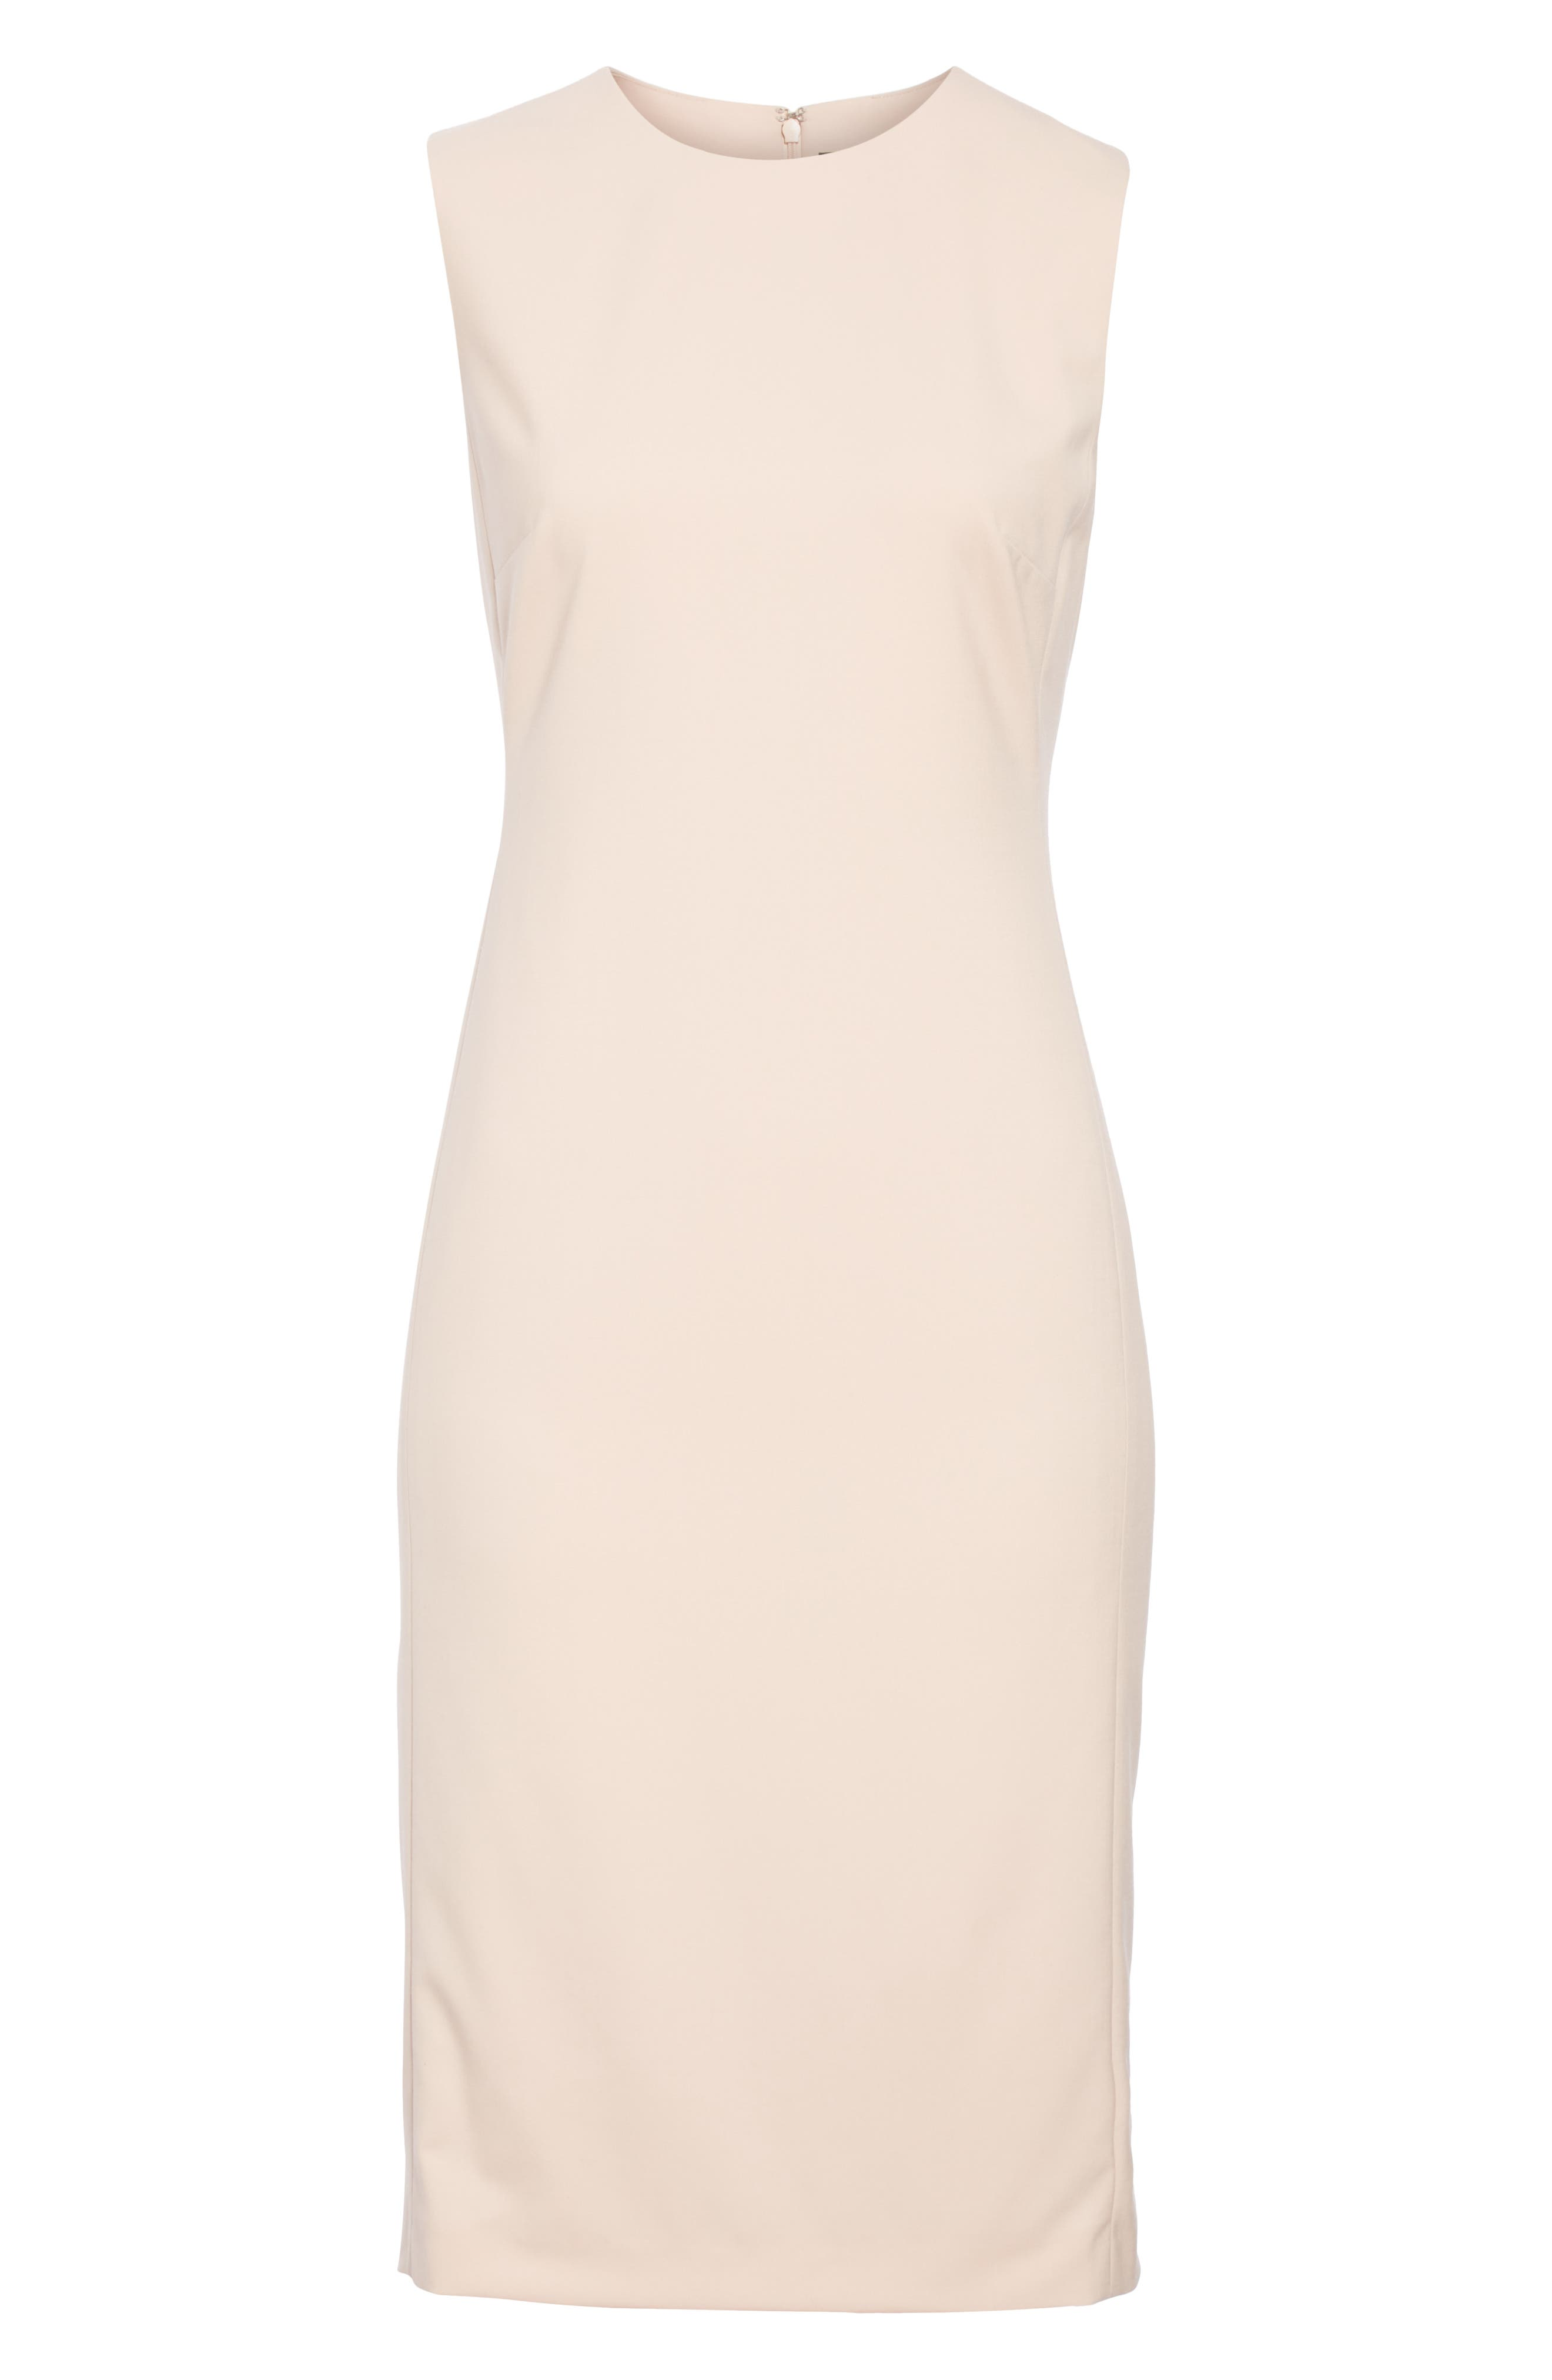 Eano Good Wool Sheath Dress,                             Alternate thumbnail 6, color,                             650